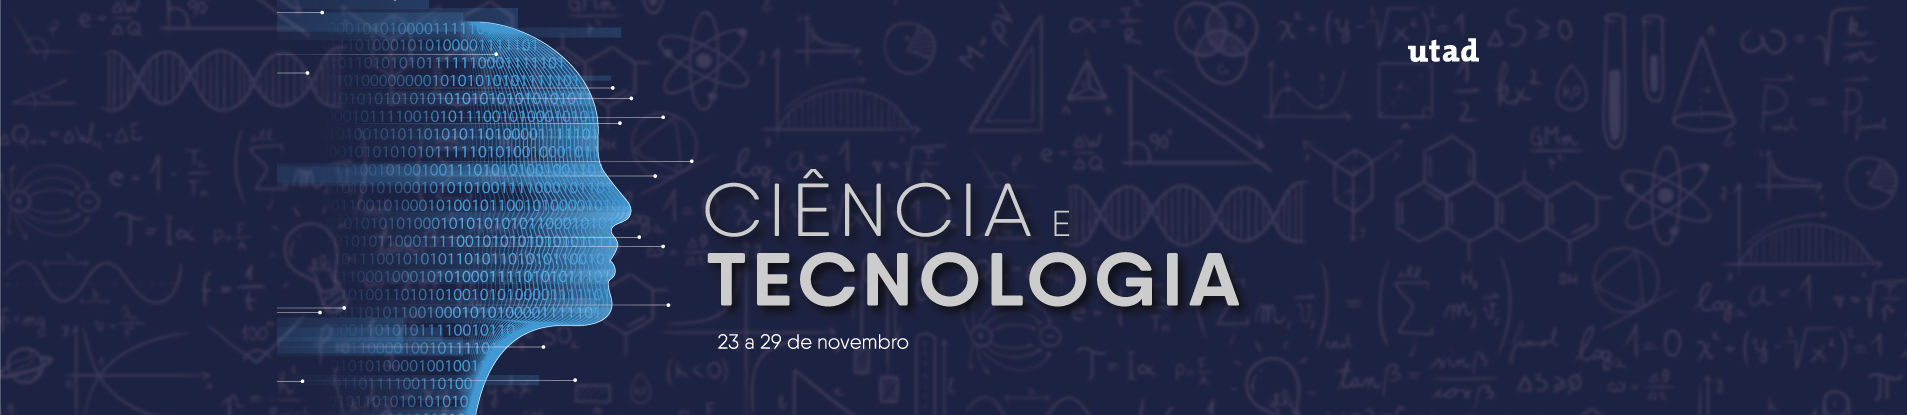 slider semana ciencia tecnologia 2020